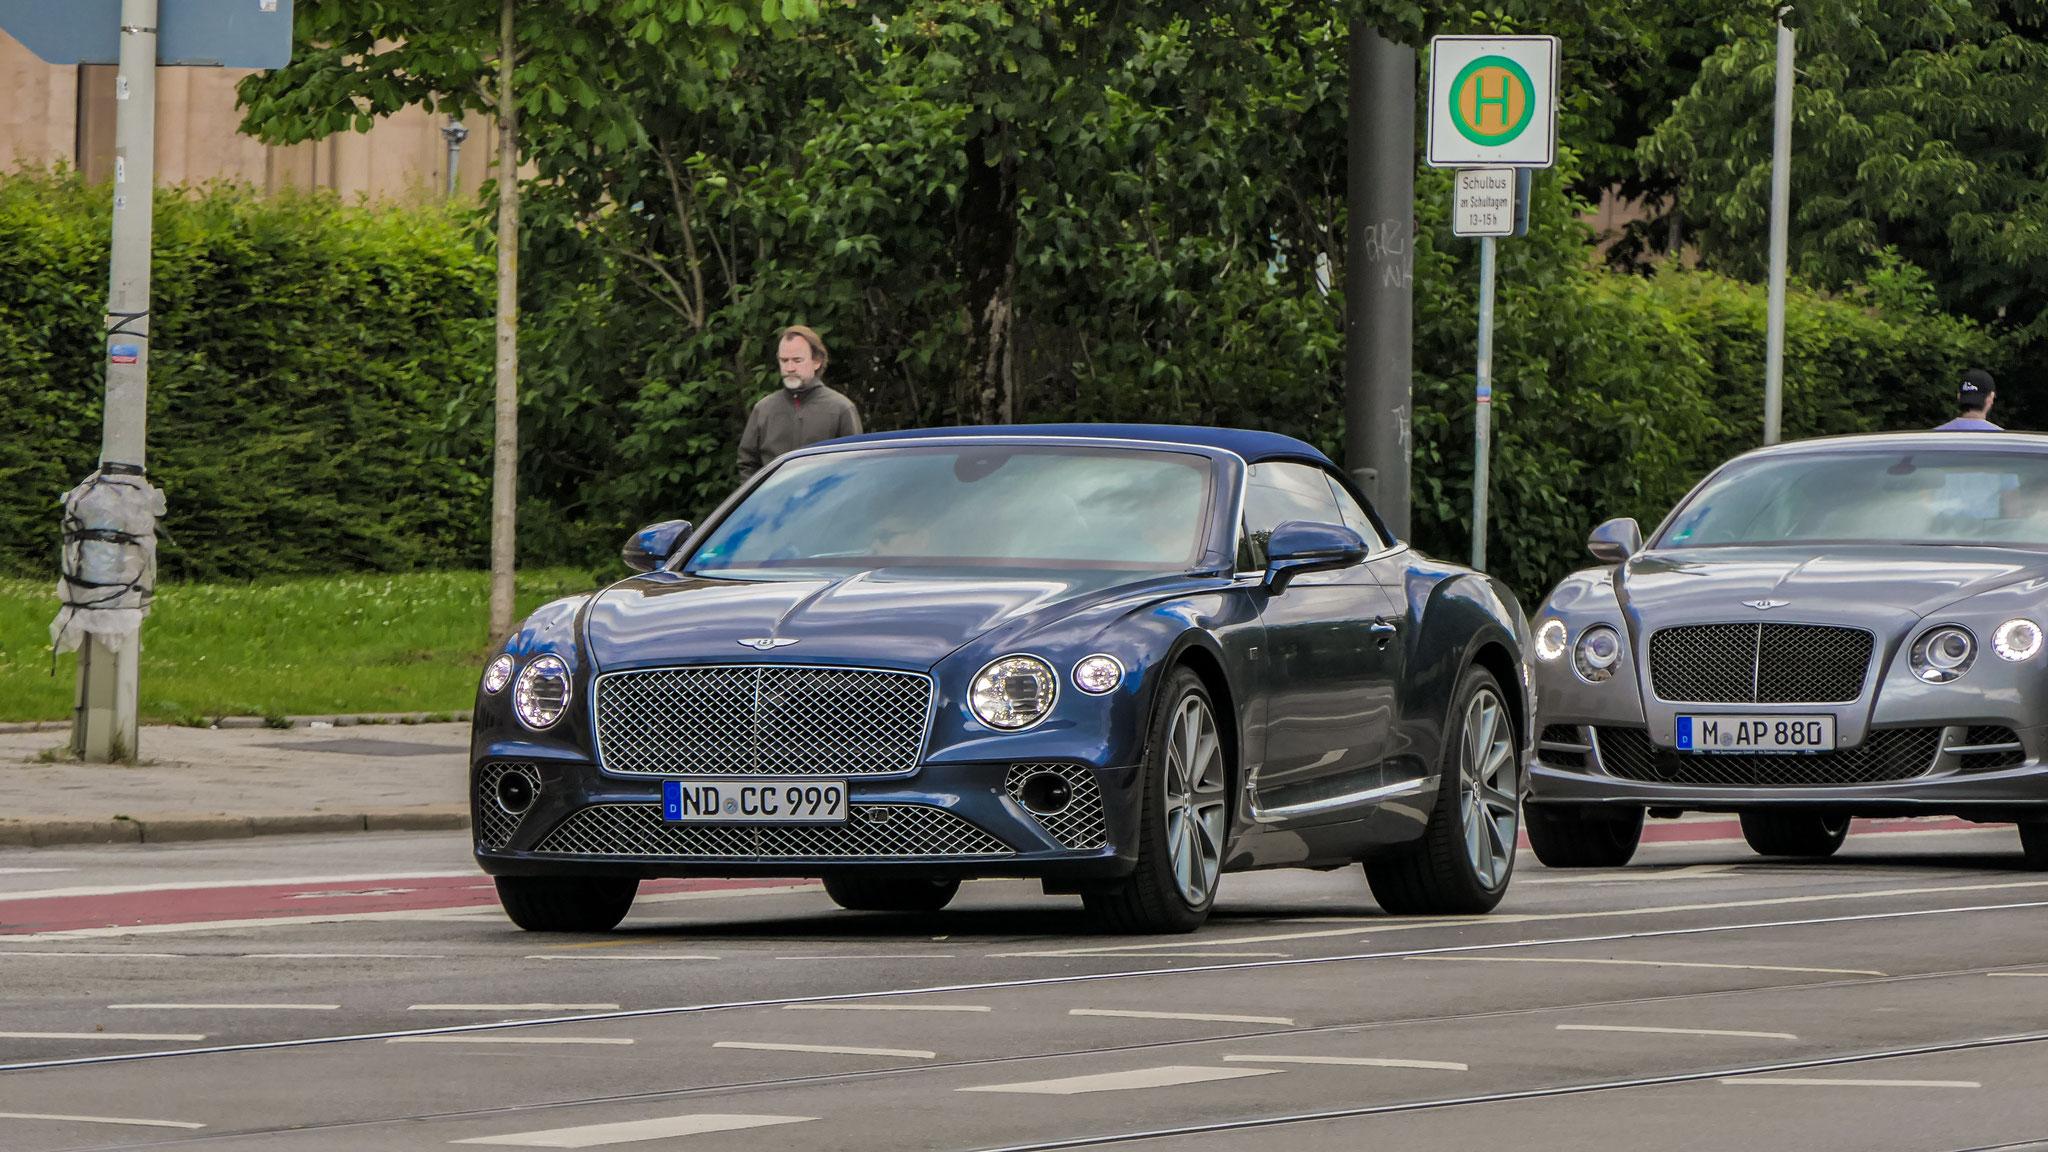 Bentley Continental GTC - ND-CC-999